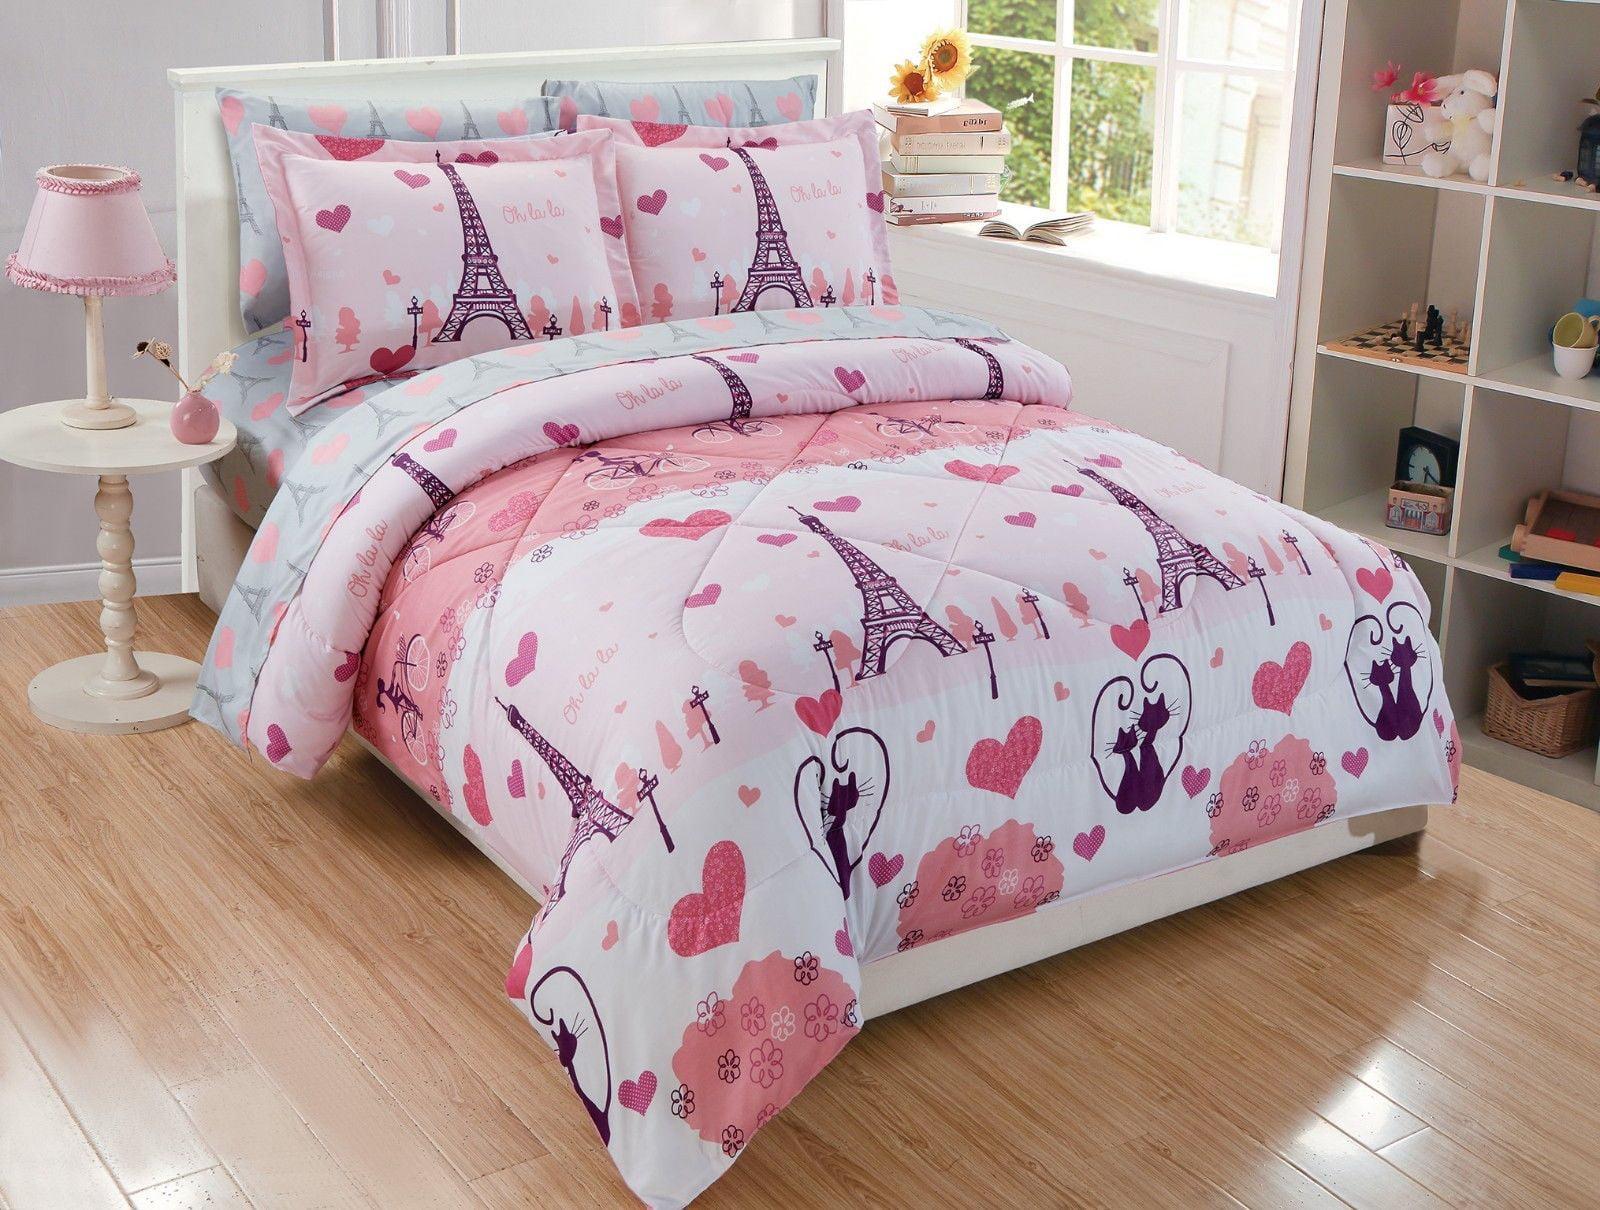 Fancy Linen 7pc Queen Size Comforter Set Girls Eiffel Tower Paris Hearts Pink Grey New Walmart Com Walmart Com